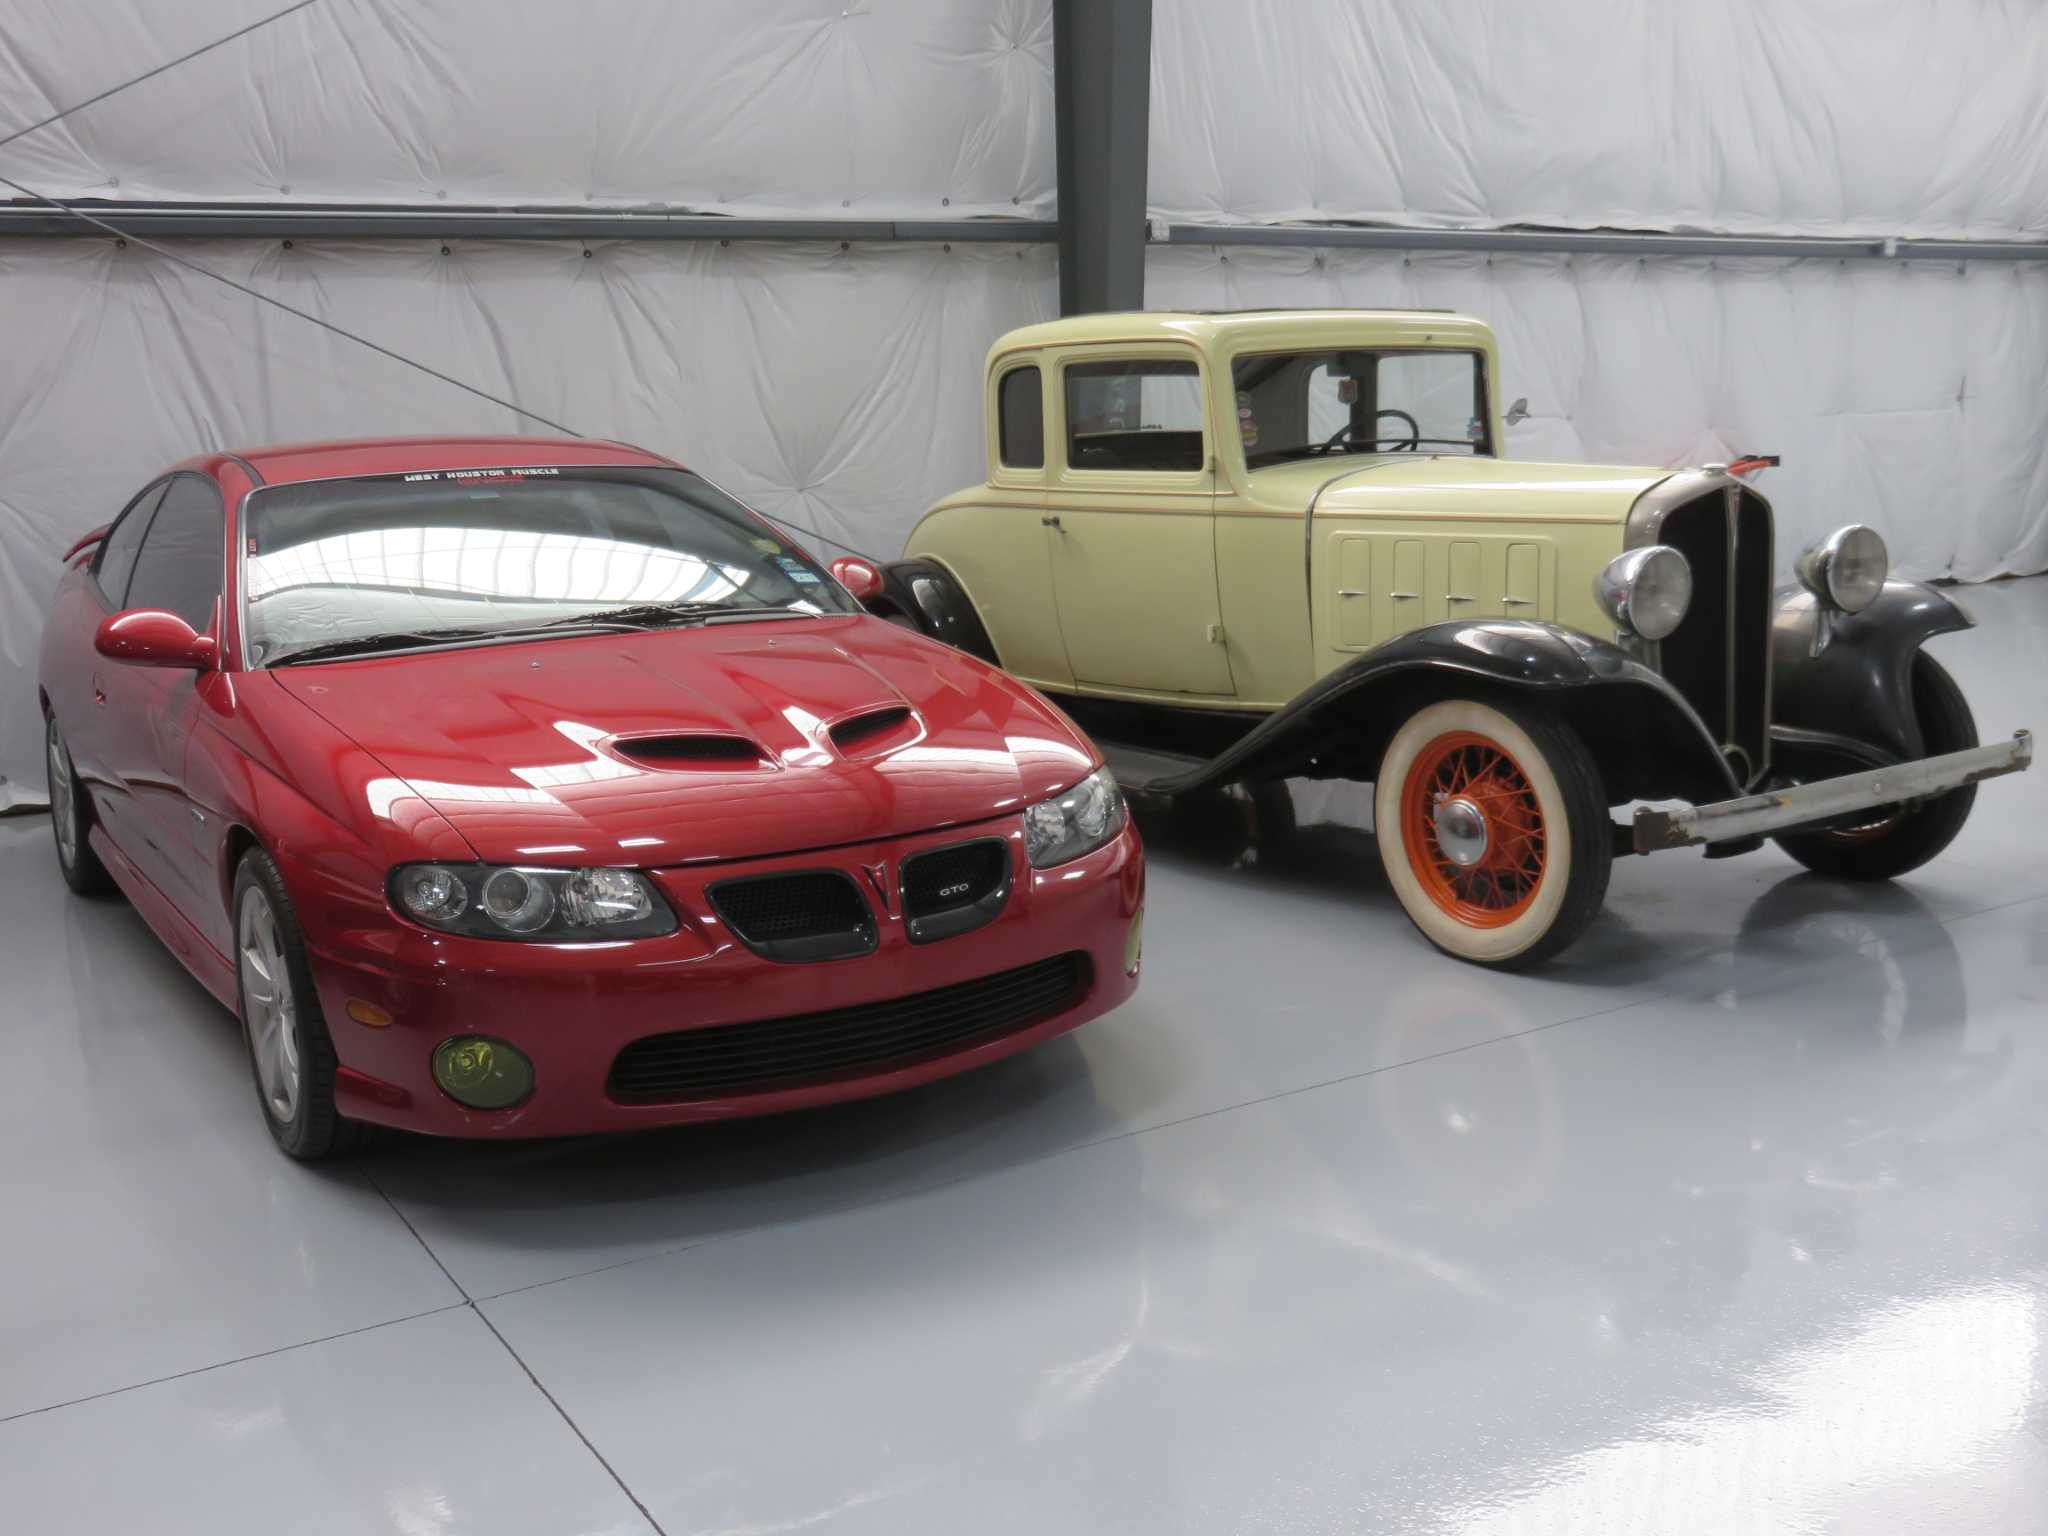 Heidi's customs & classics: West Houston Muscle car club celebrates its ninth anniversary